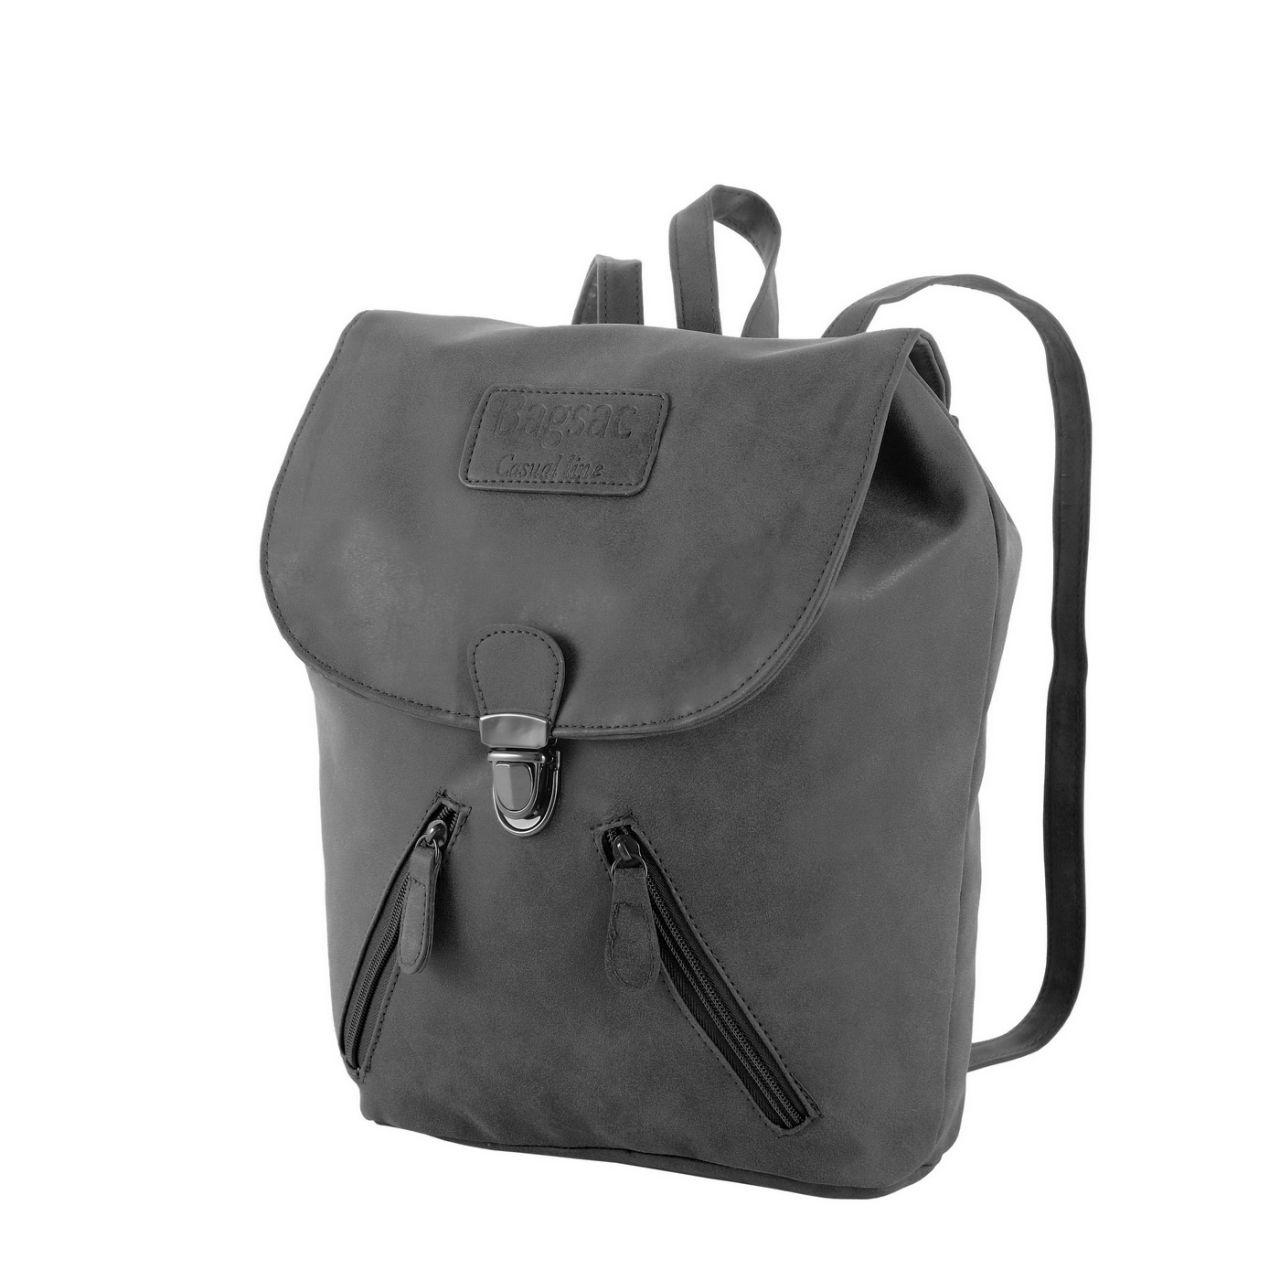 Bagsac Damenrucksack S25 dunkelgrau